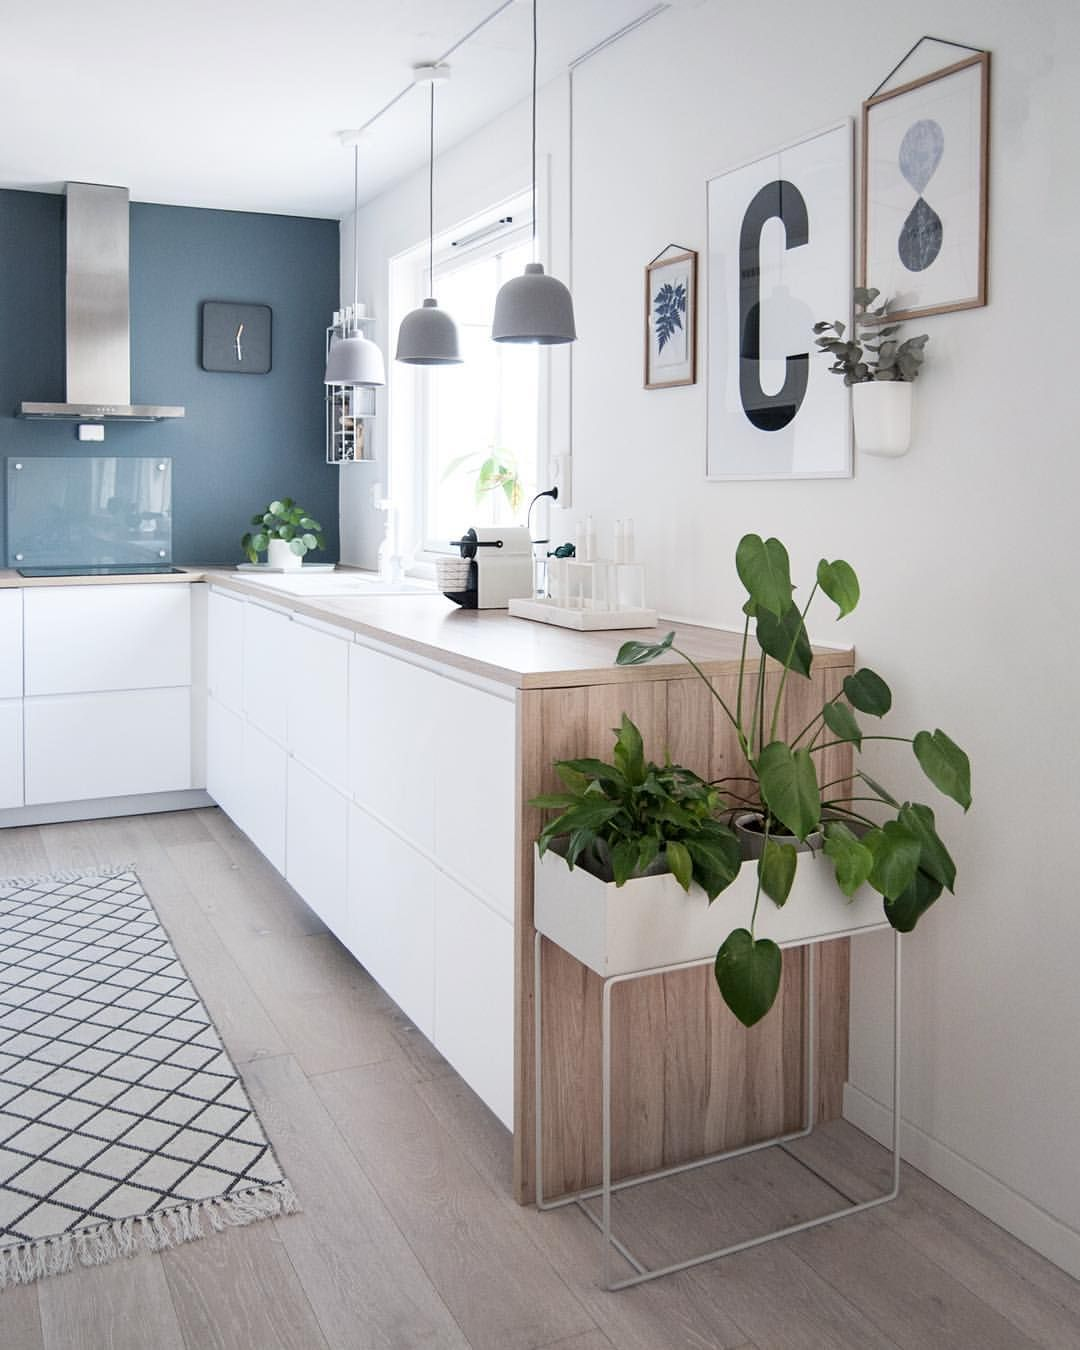 Pin de Claire Brandwood en Kitchen | Pinterest | Cocinas, Casa campo ...